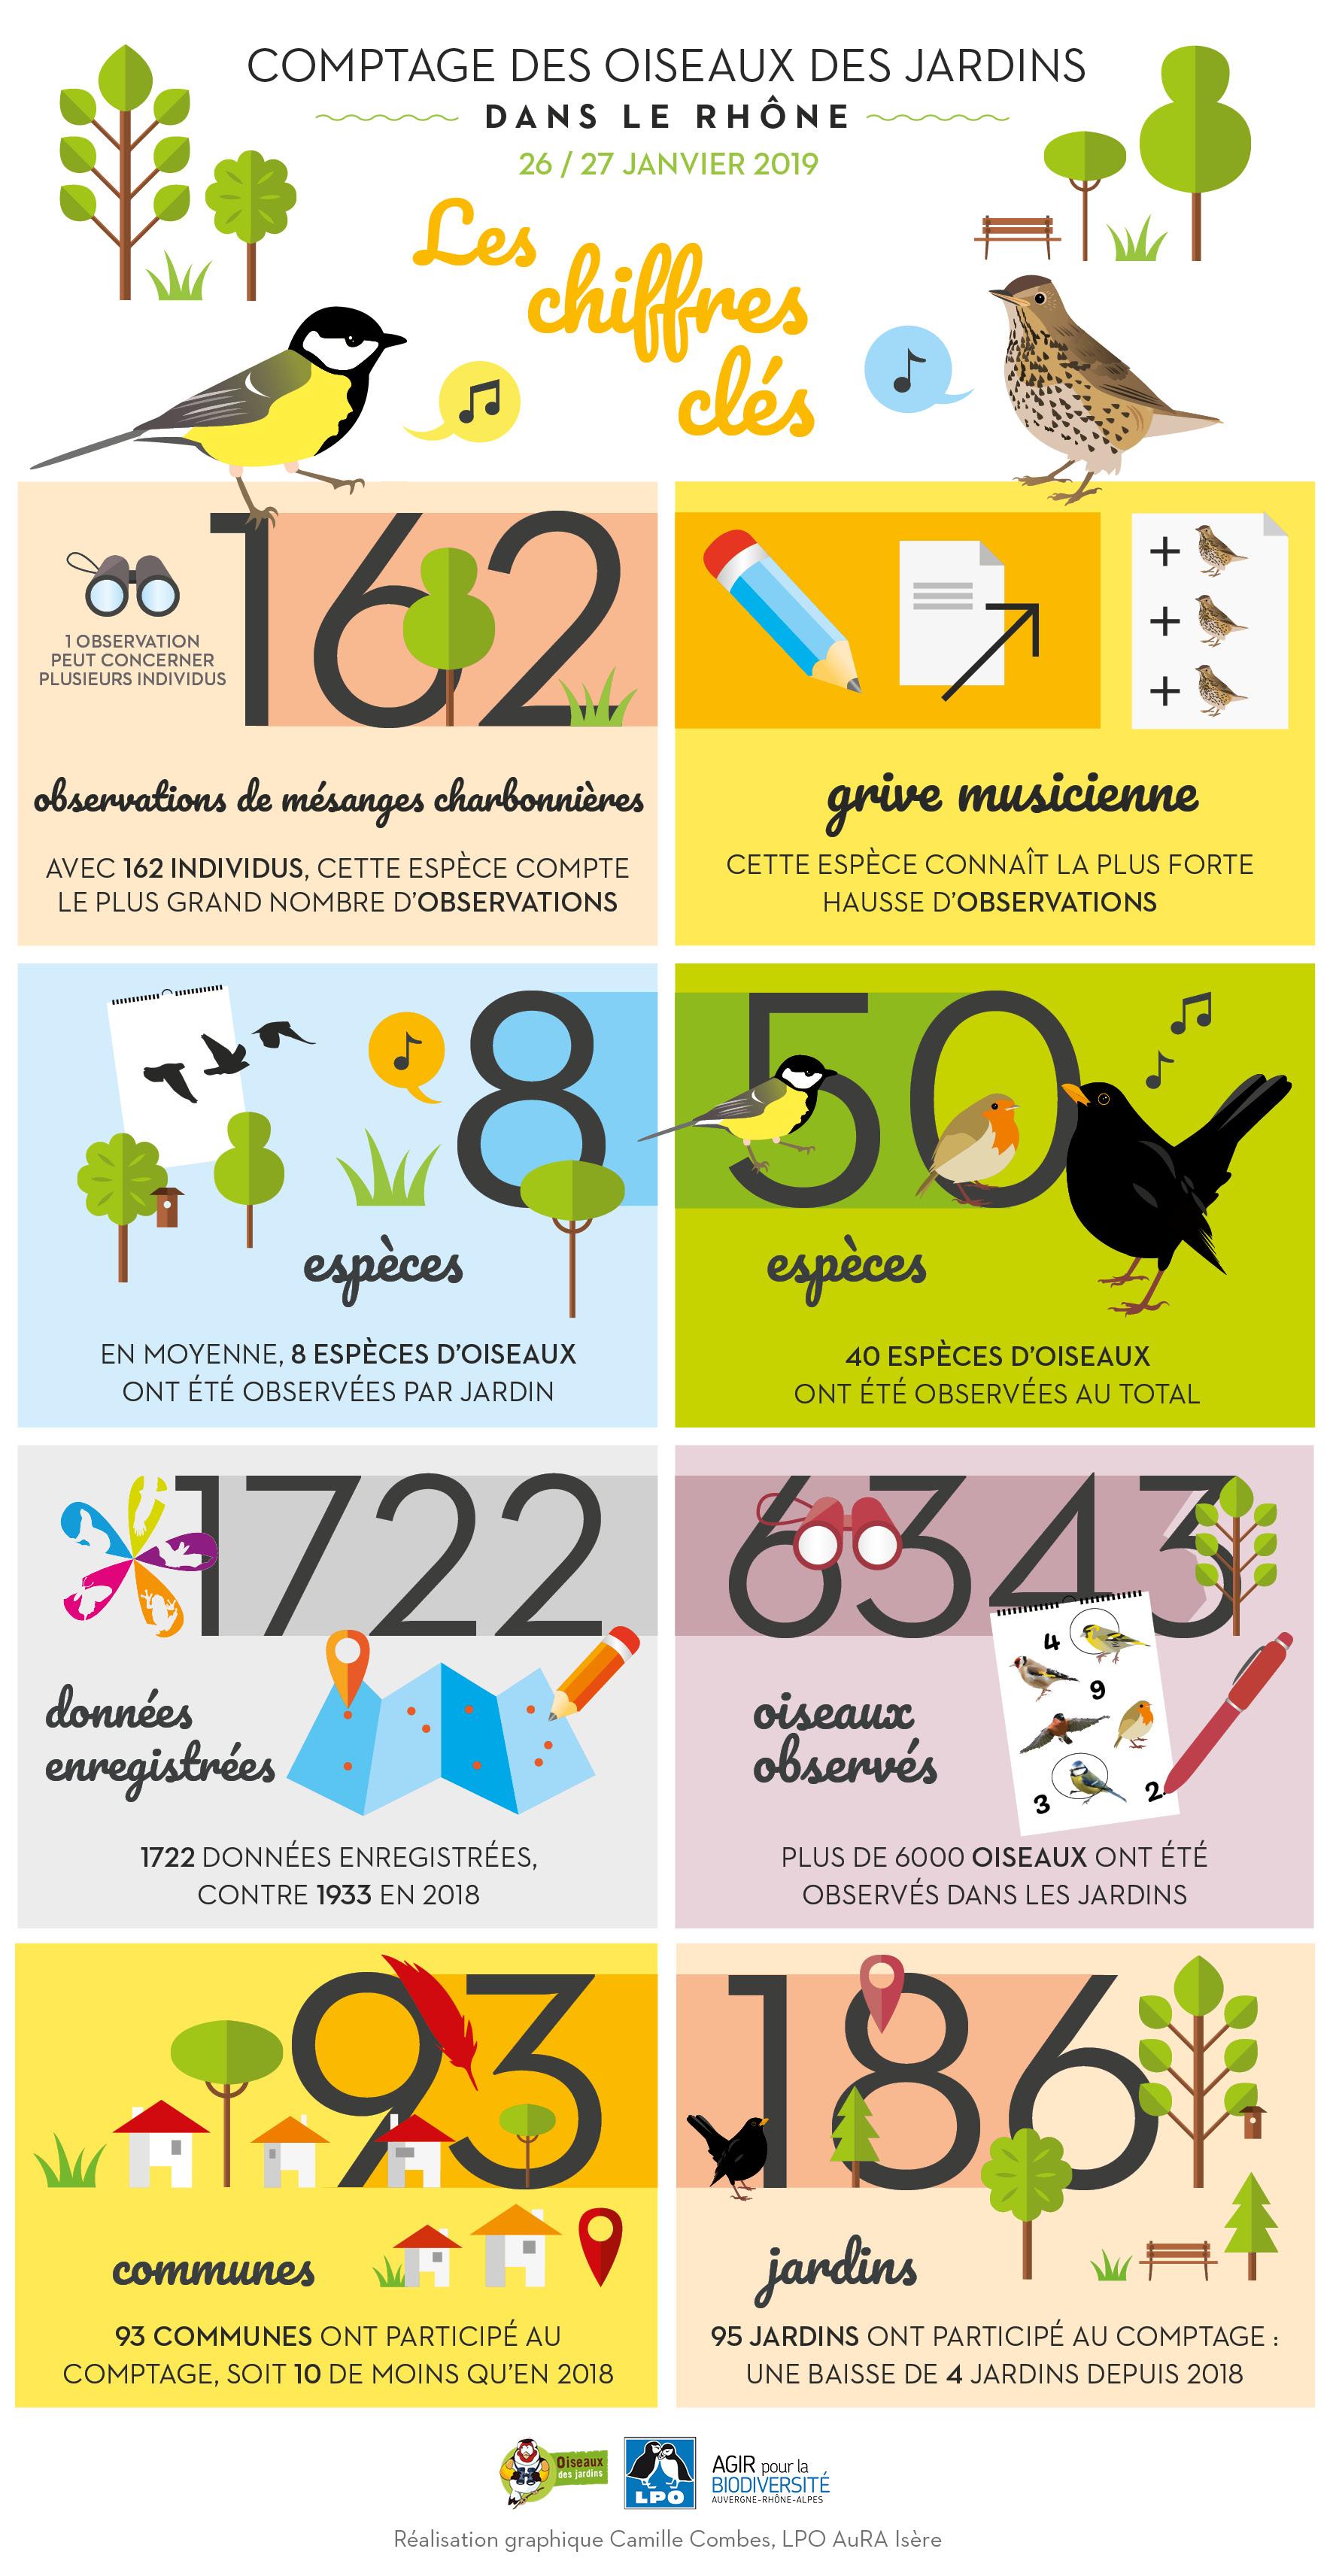 https://cdnfiles1.biolovision.net/www.faune-rhone.org/userfiles/OiseauxDesJardins/ODJRhneJan2019.jpg